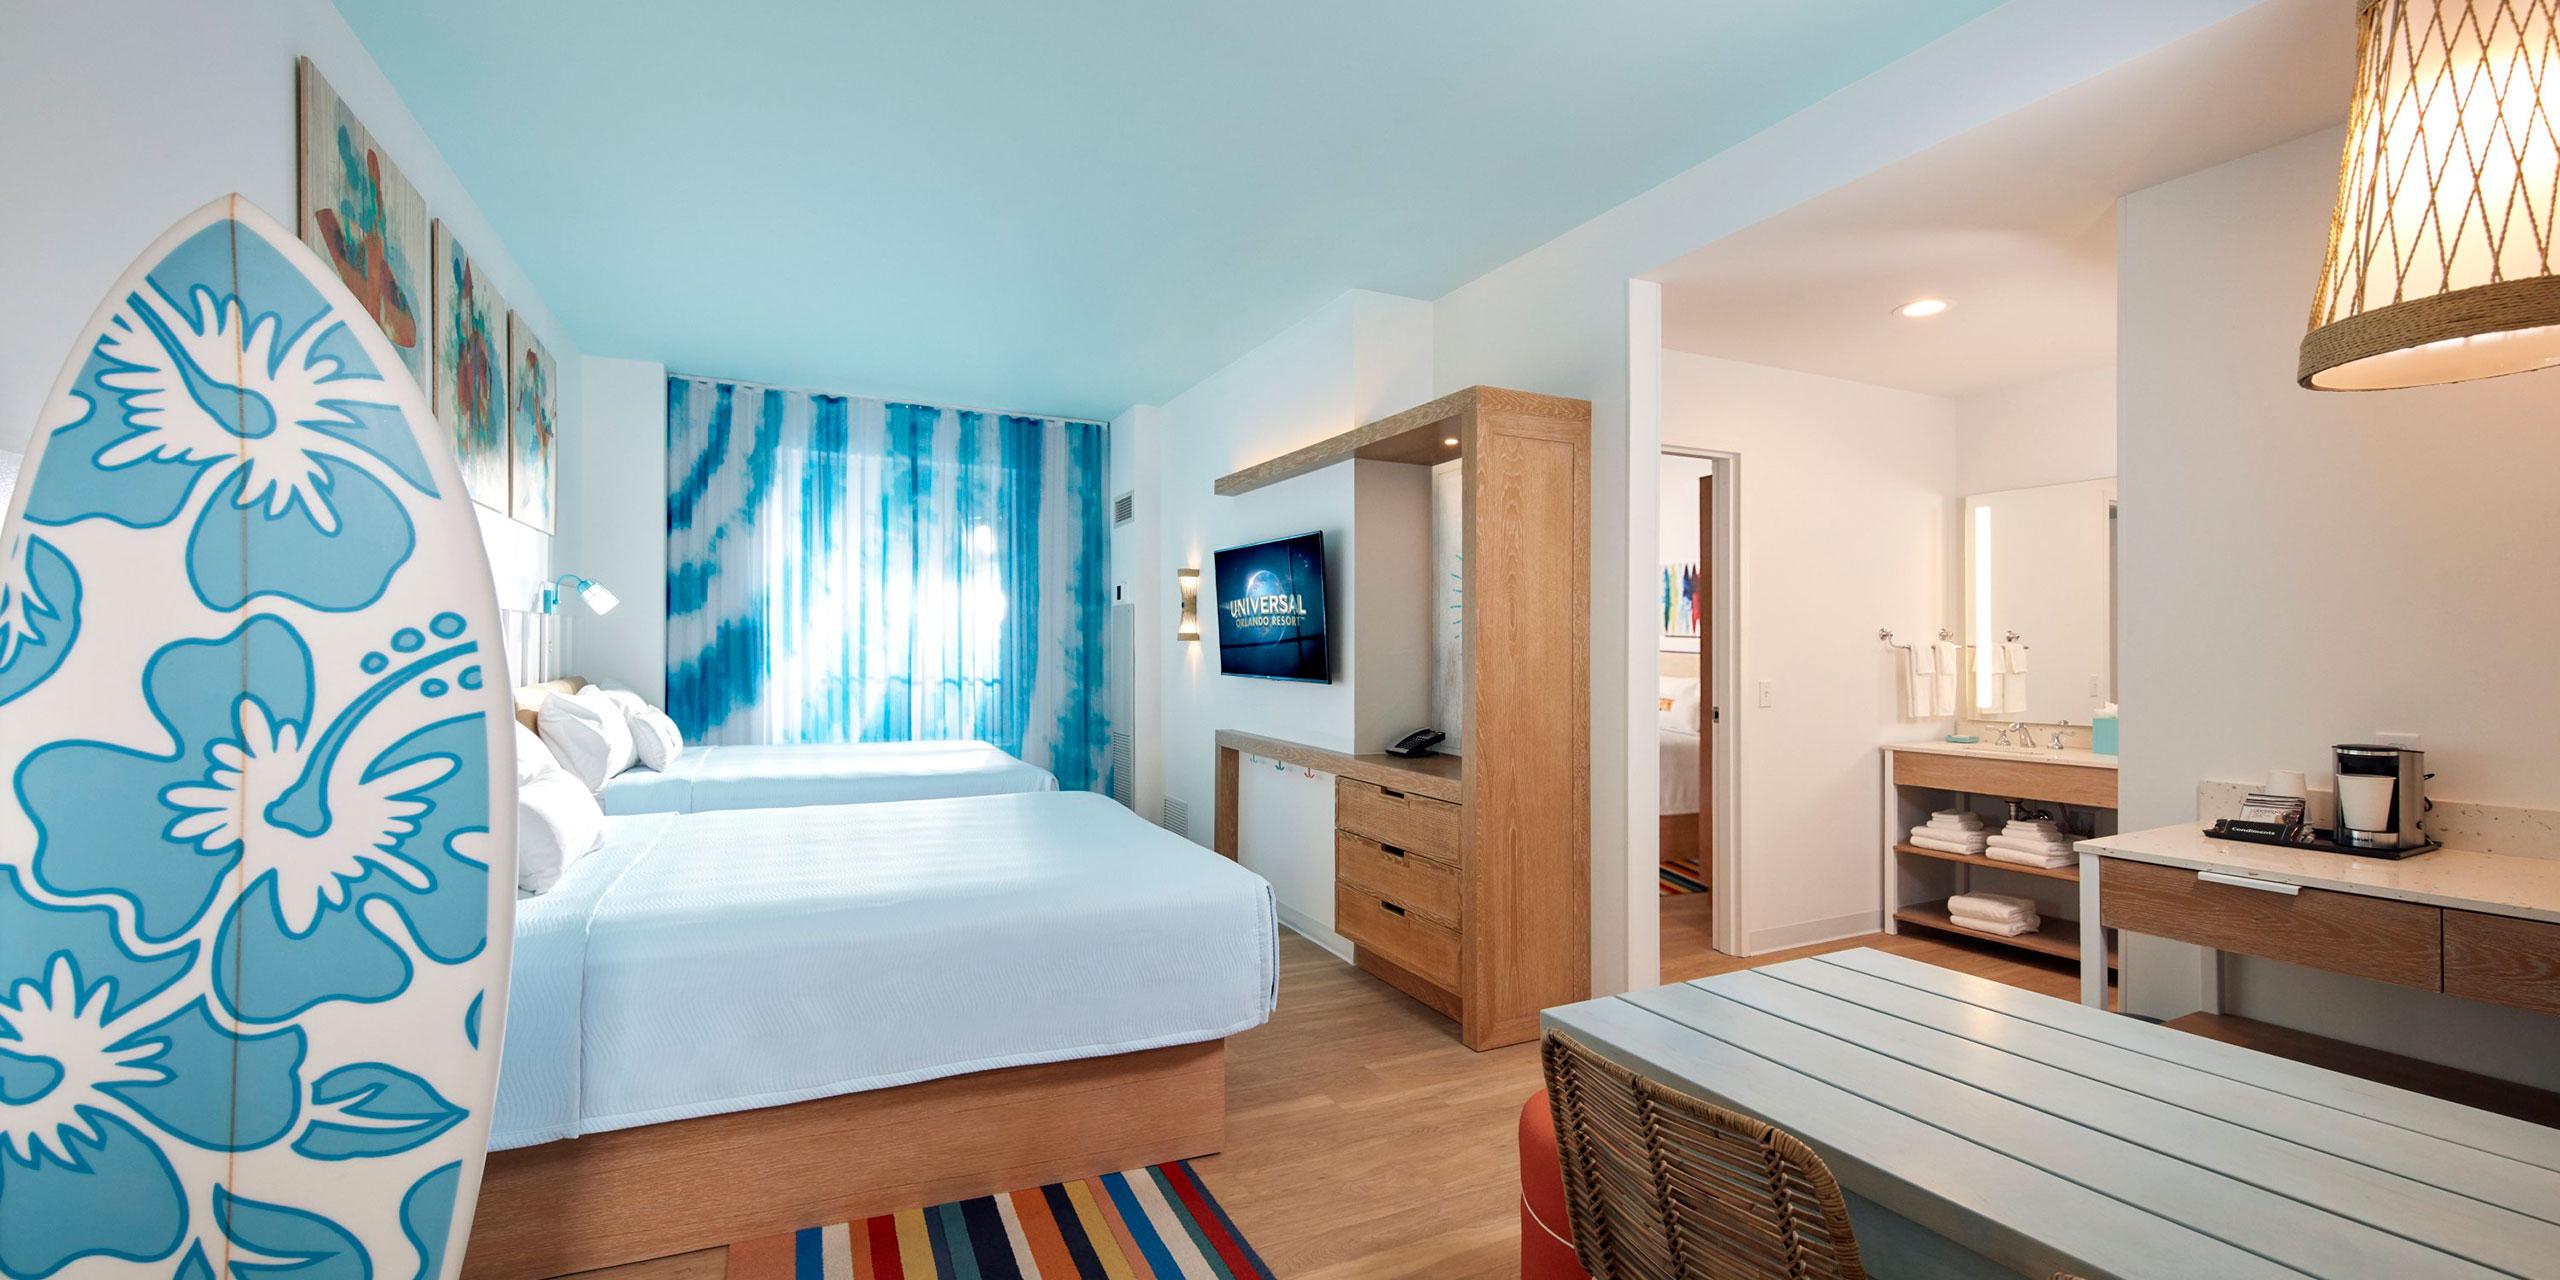 Surfside Inn and Suites; Courtesy of Universal Orlando Resort